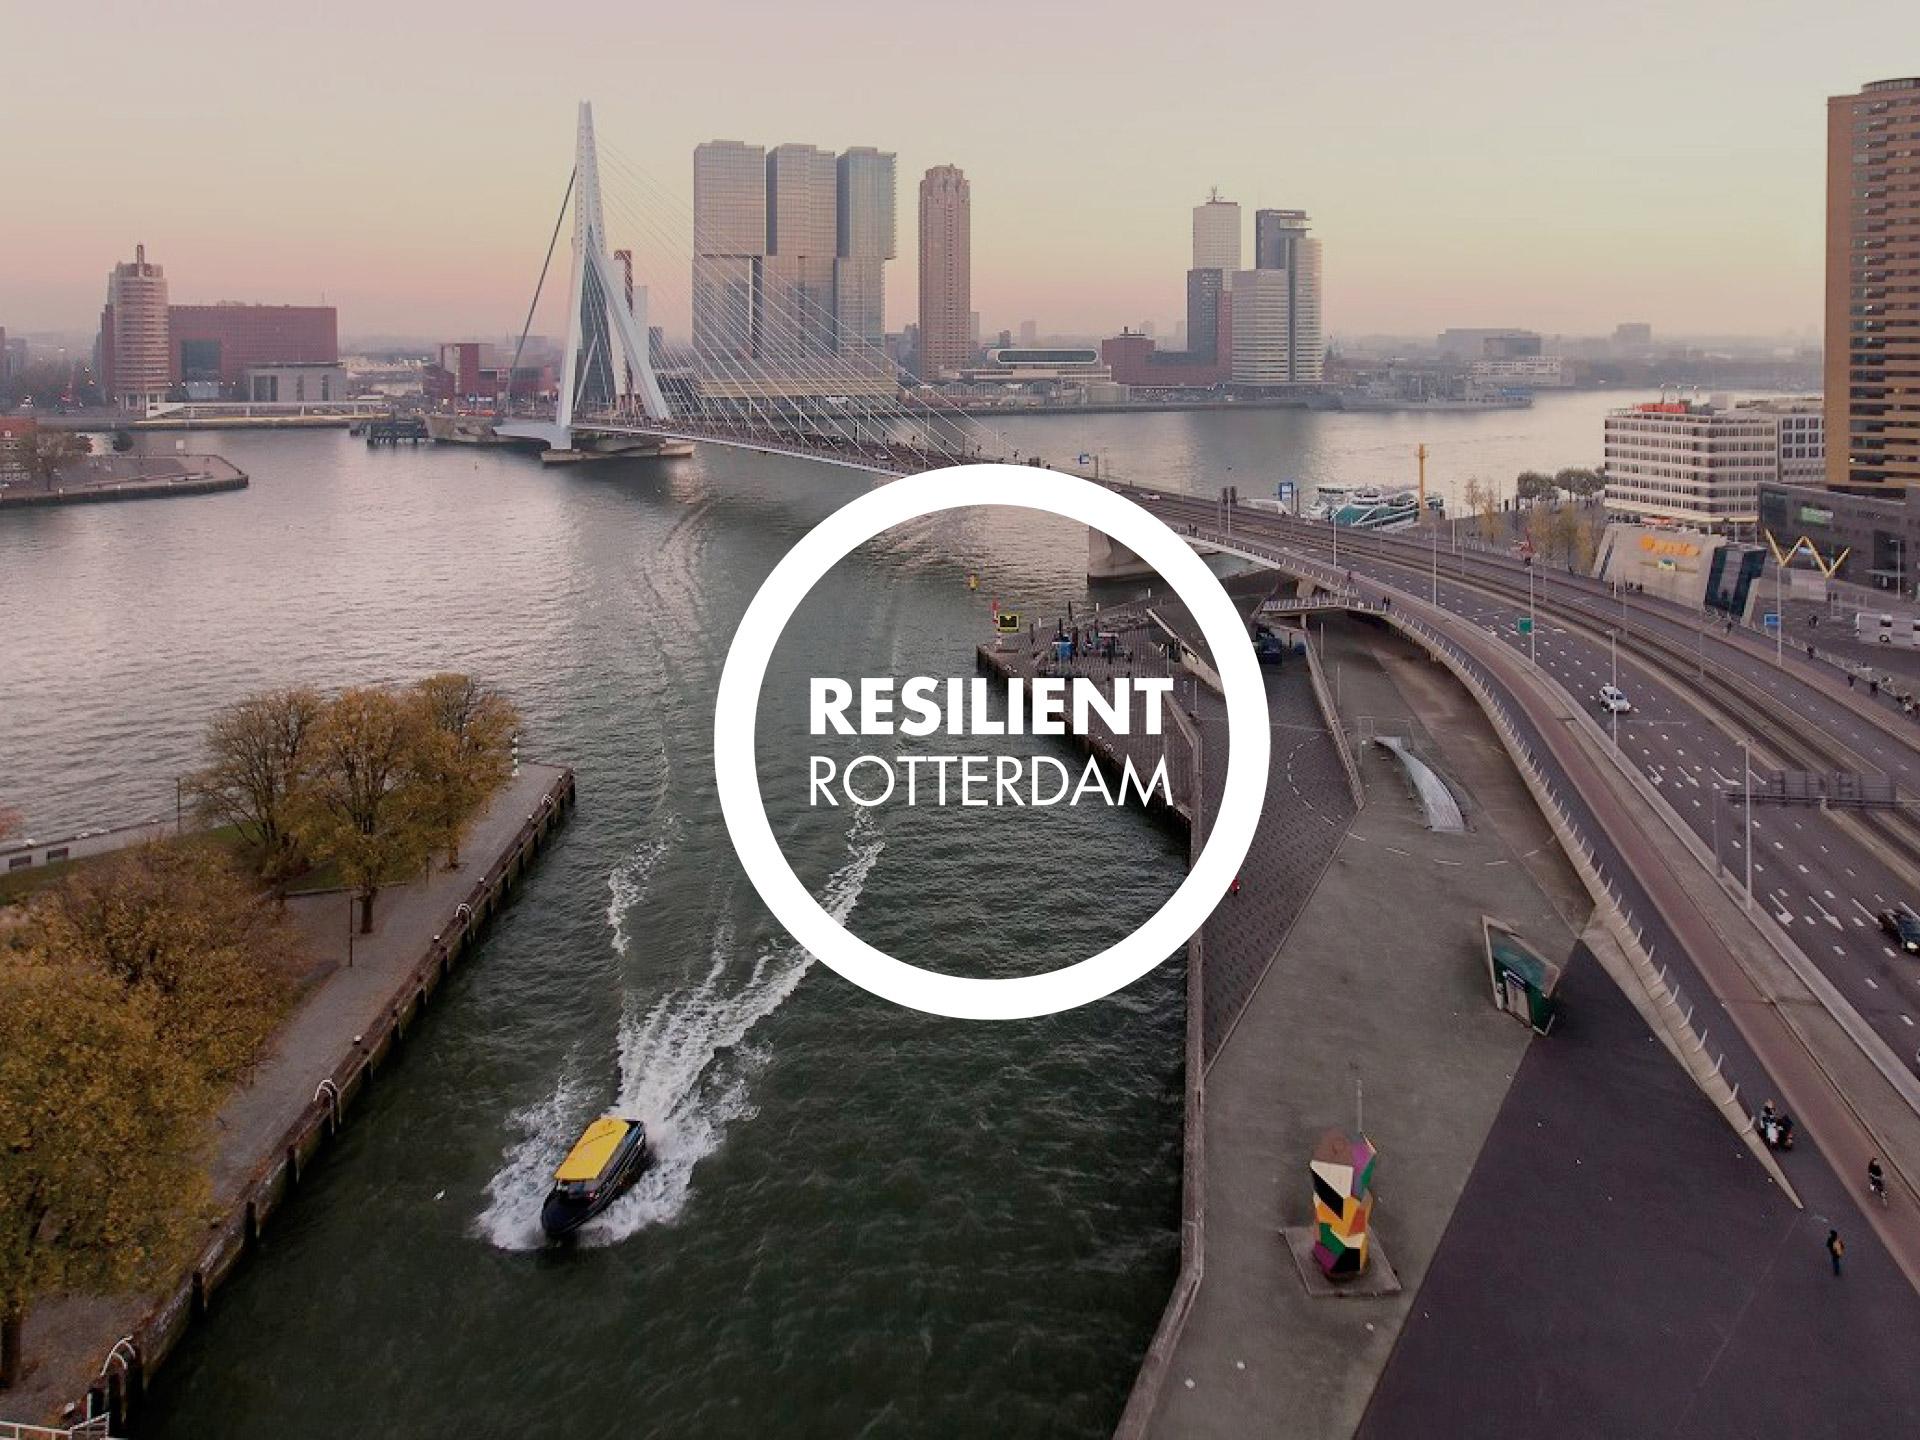 Resilient Rotterdam (Gemeente Rotterdam)